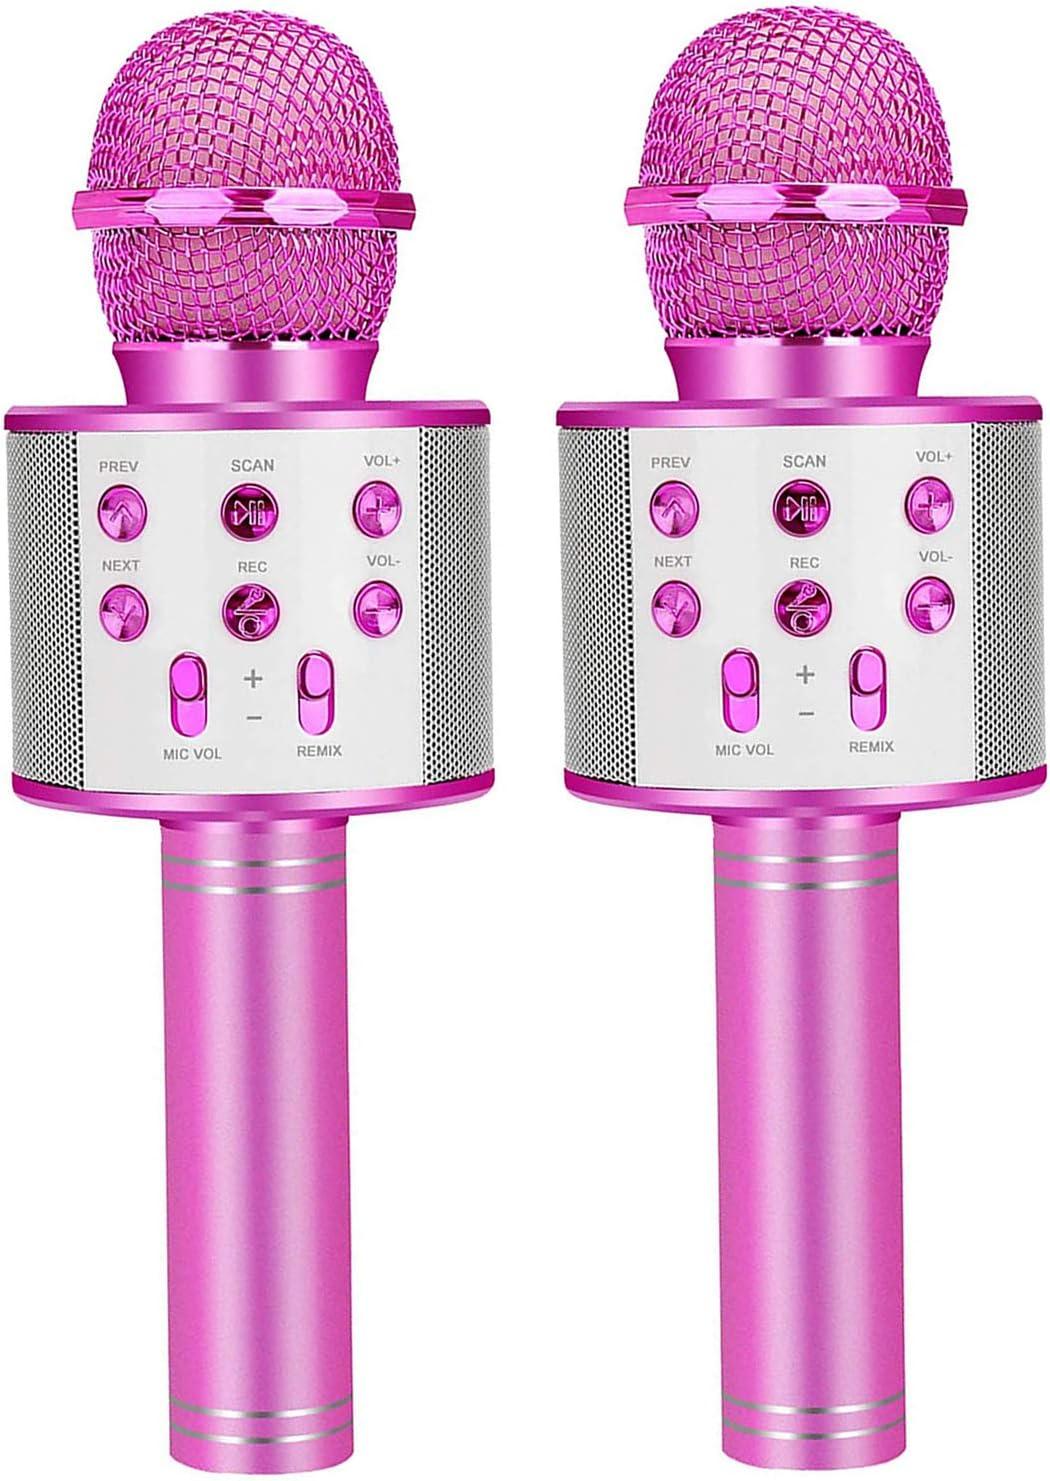 Wireless Karaoke Microphone for Kids Portable Bluetooth Speaker Mic Birthday Gift Toys for 3-12 Year Old Girls Boys Recording Magic Singing Karaoke Machine